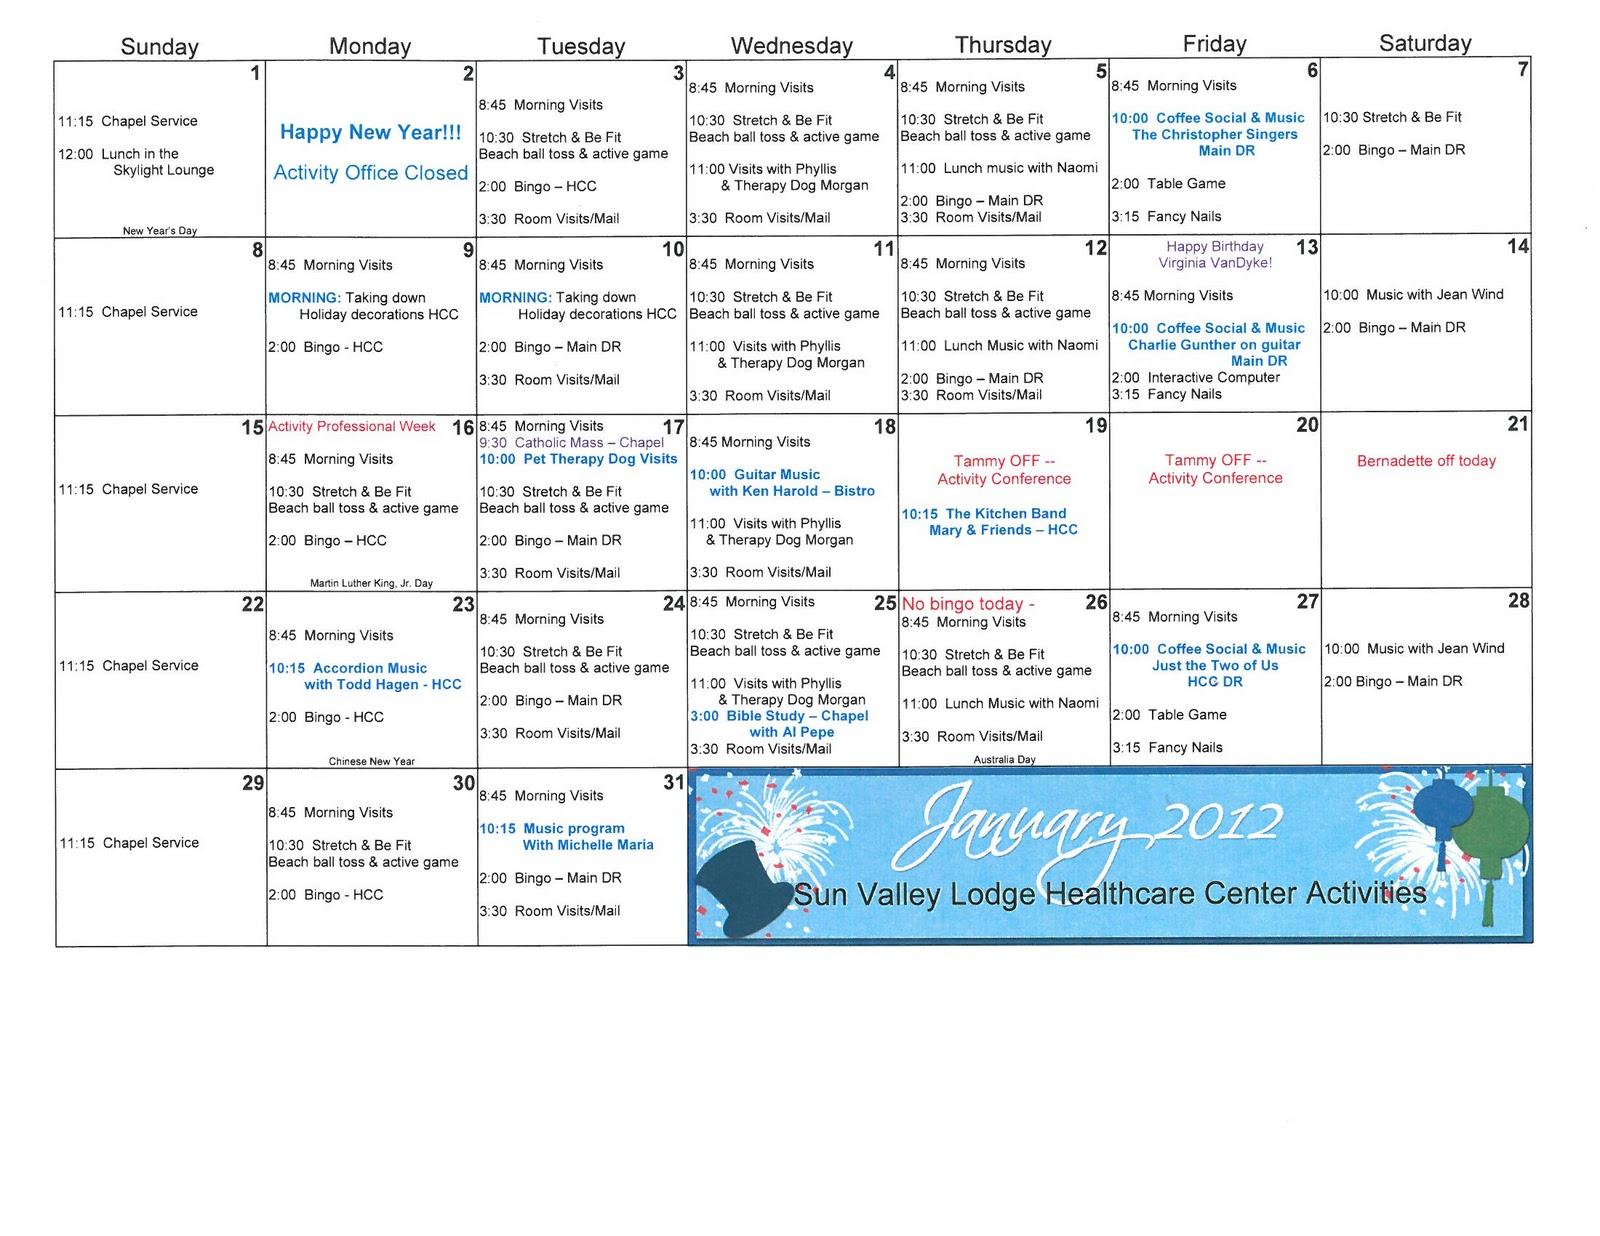 January Hcc Activities